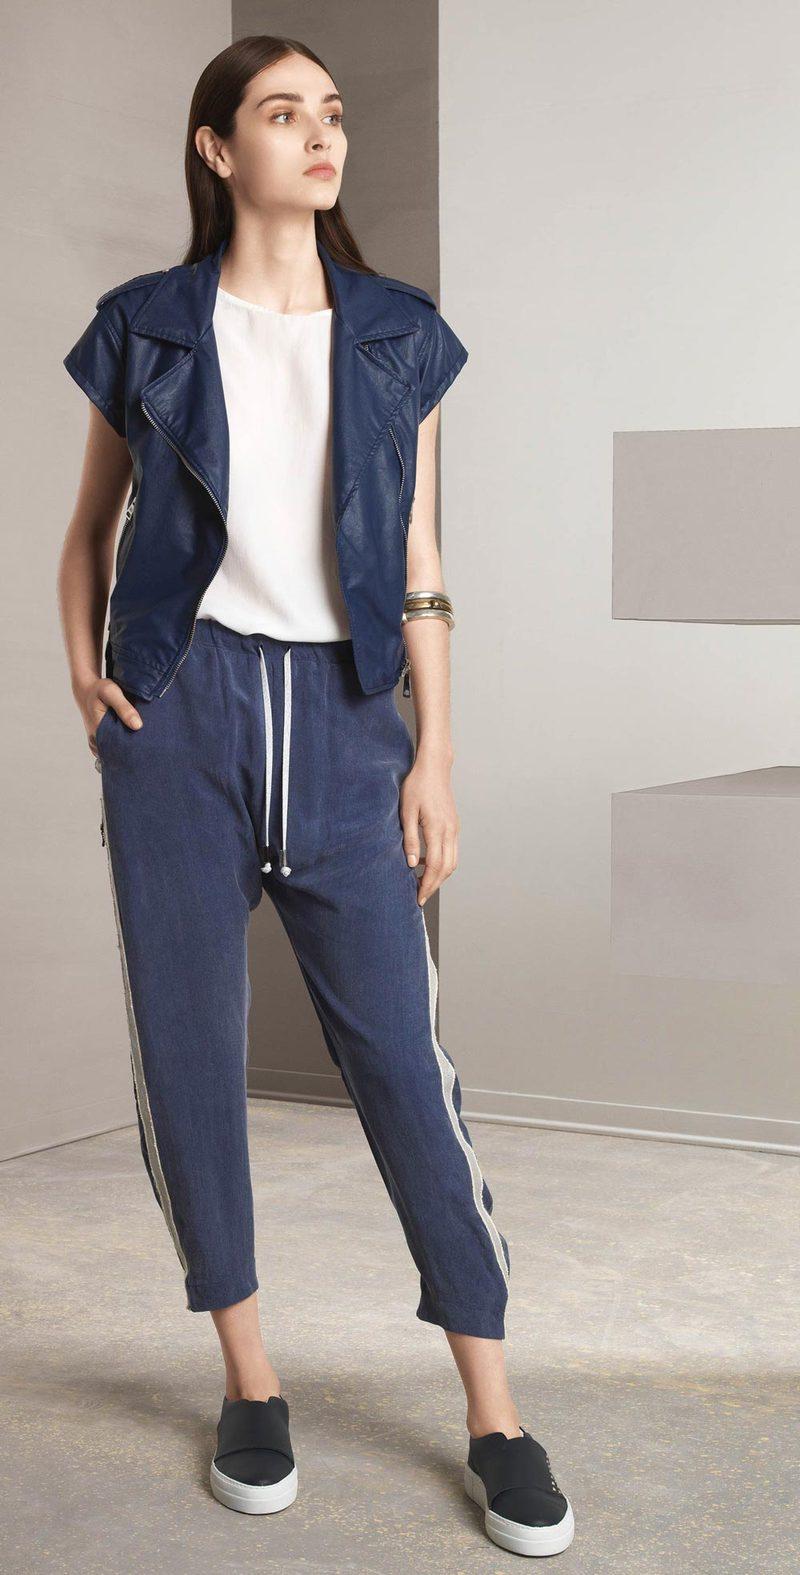 Pantalone blu con bande laterali